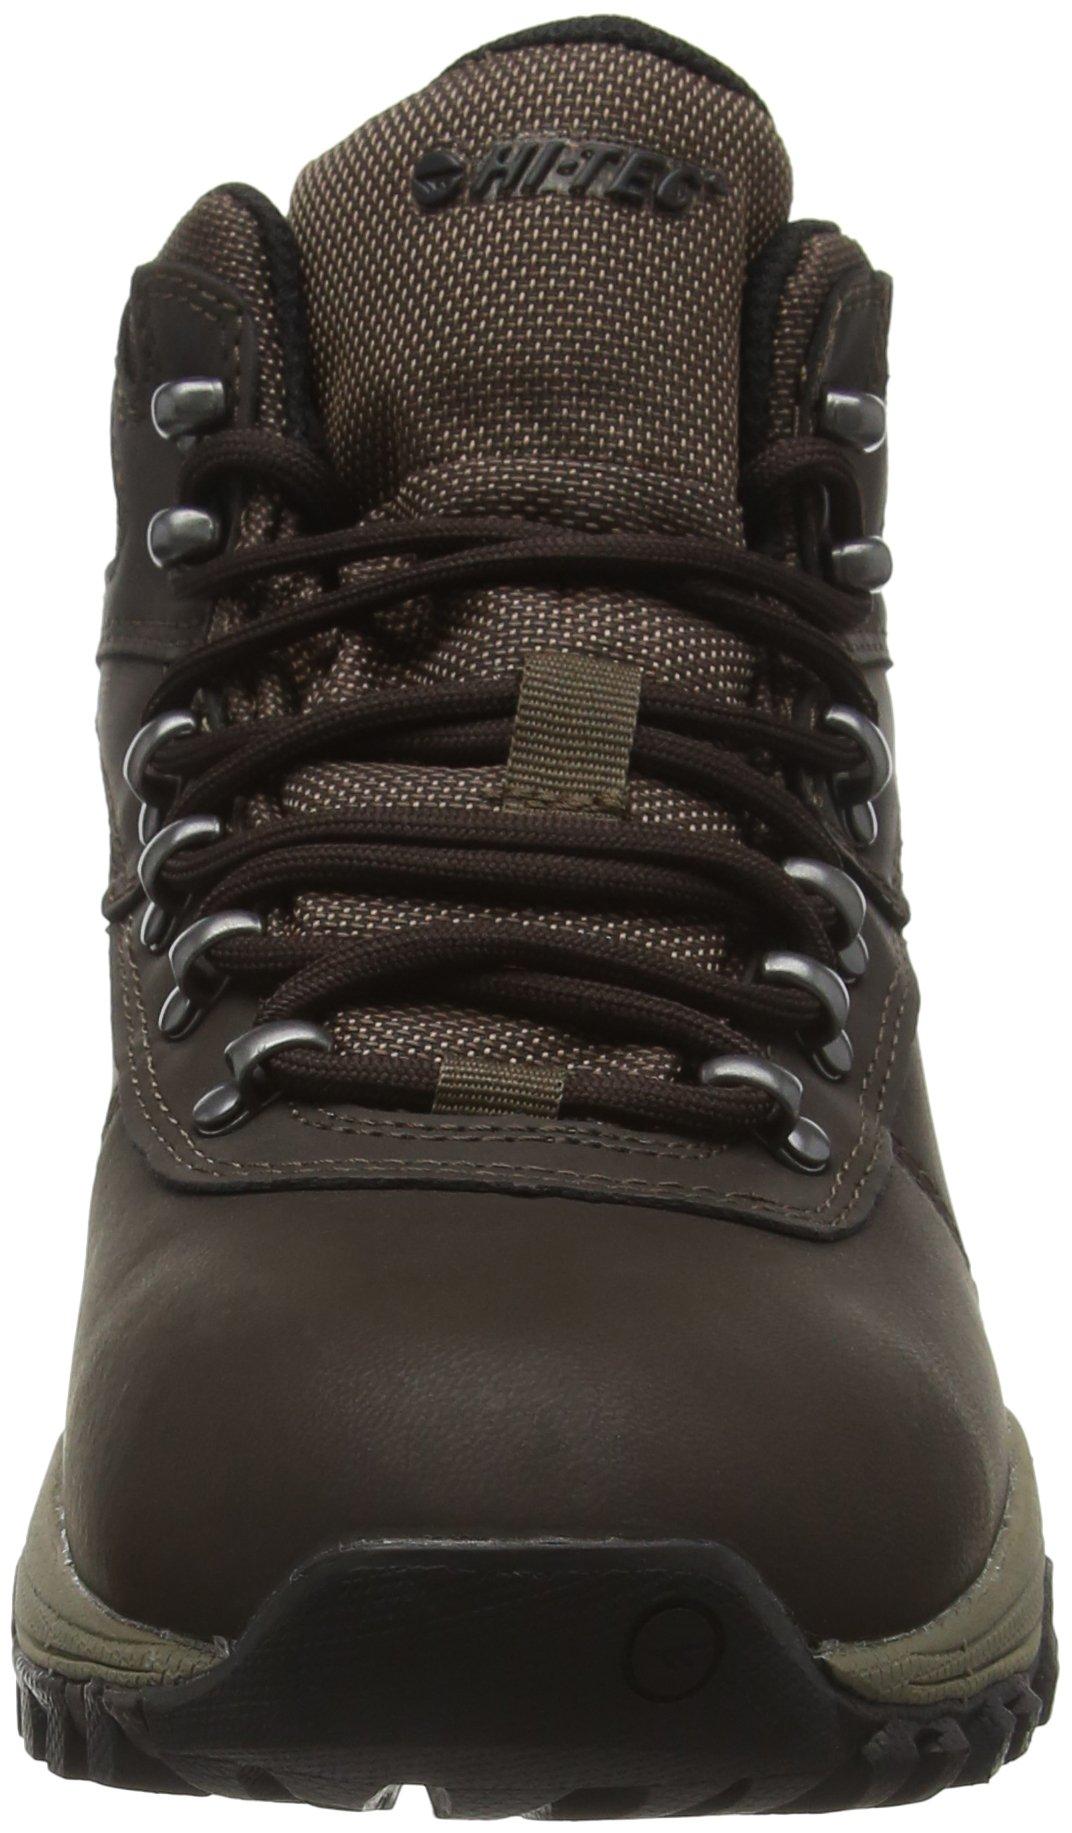 Hi-Tec Women's Cascadia Waterproof High Rise Hiking Boots 4